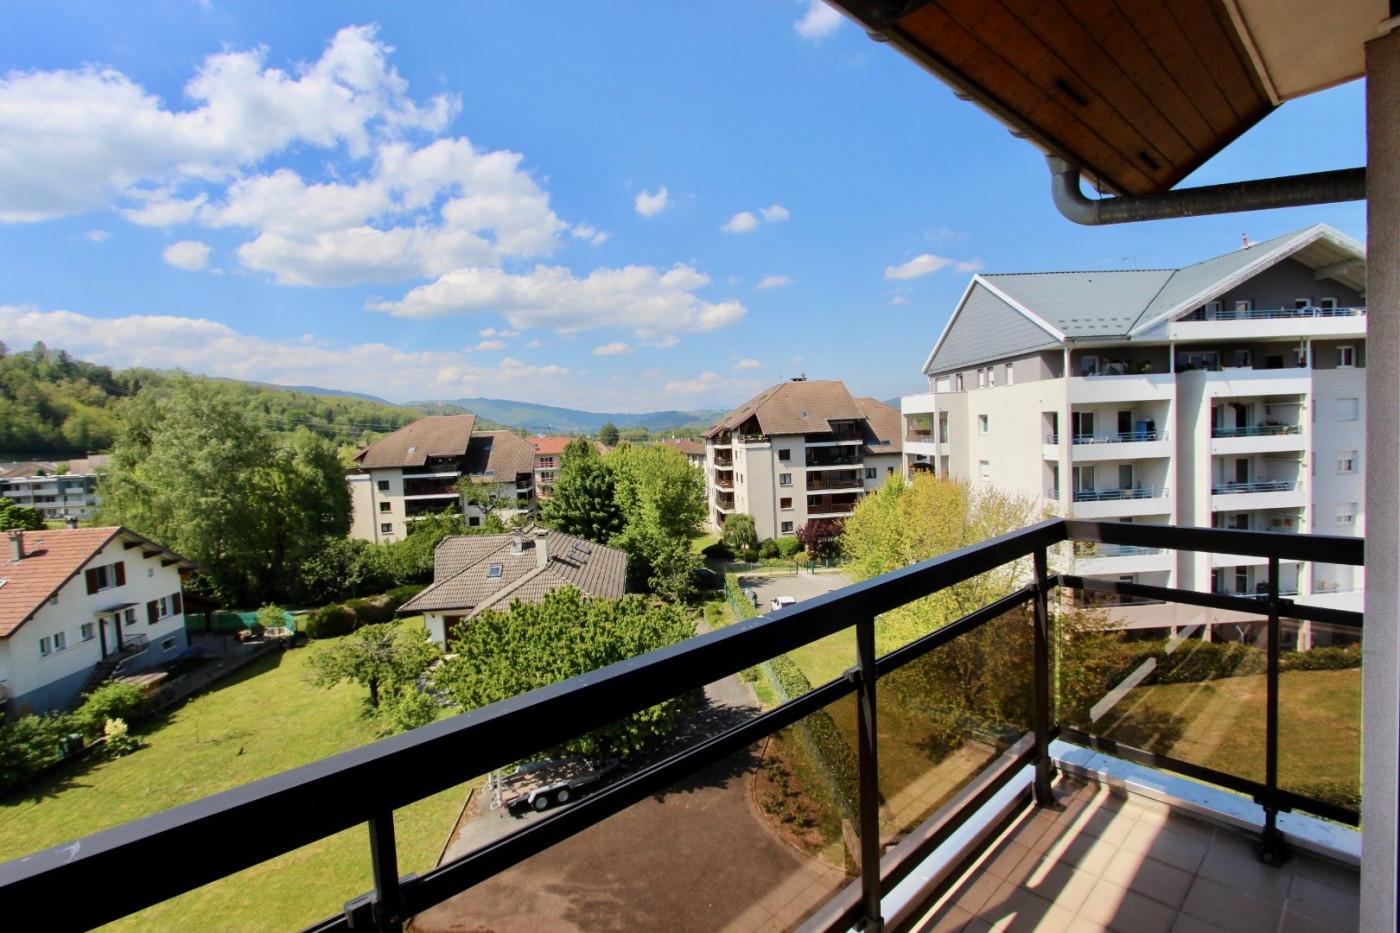 A vendre  Rumilly | Réf 74023153 - Resonance immobilière